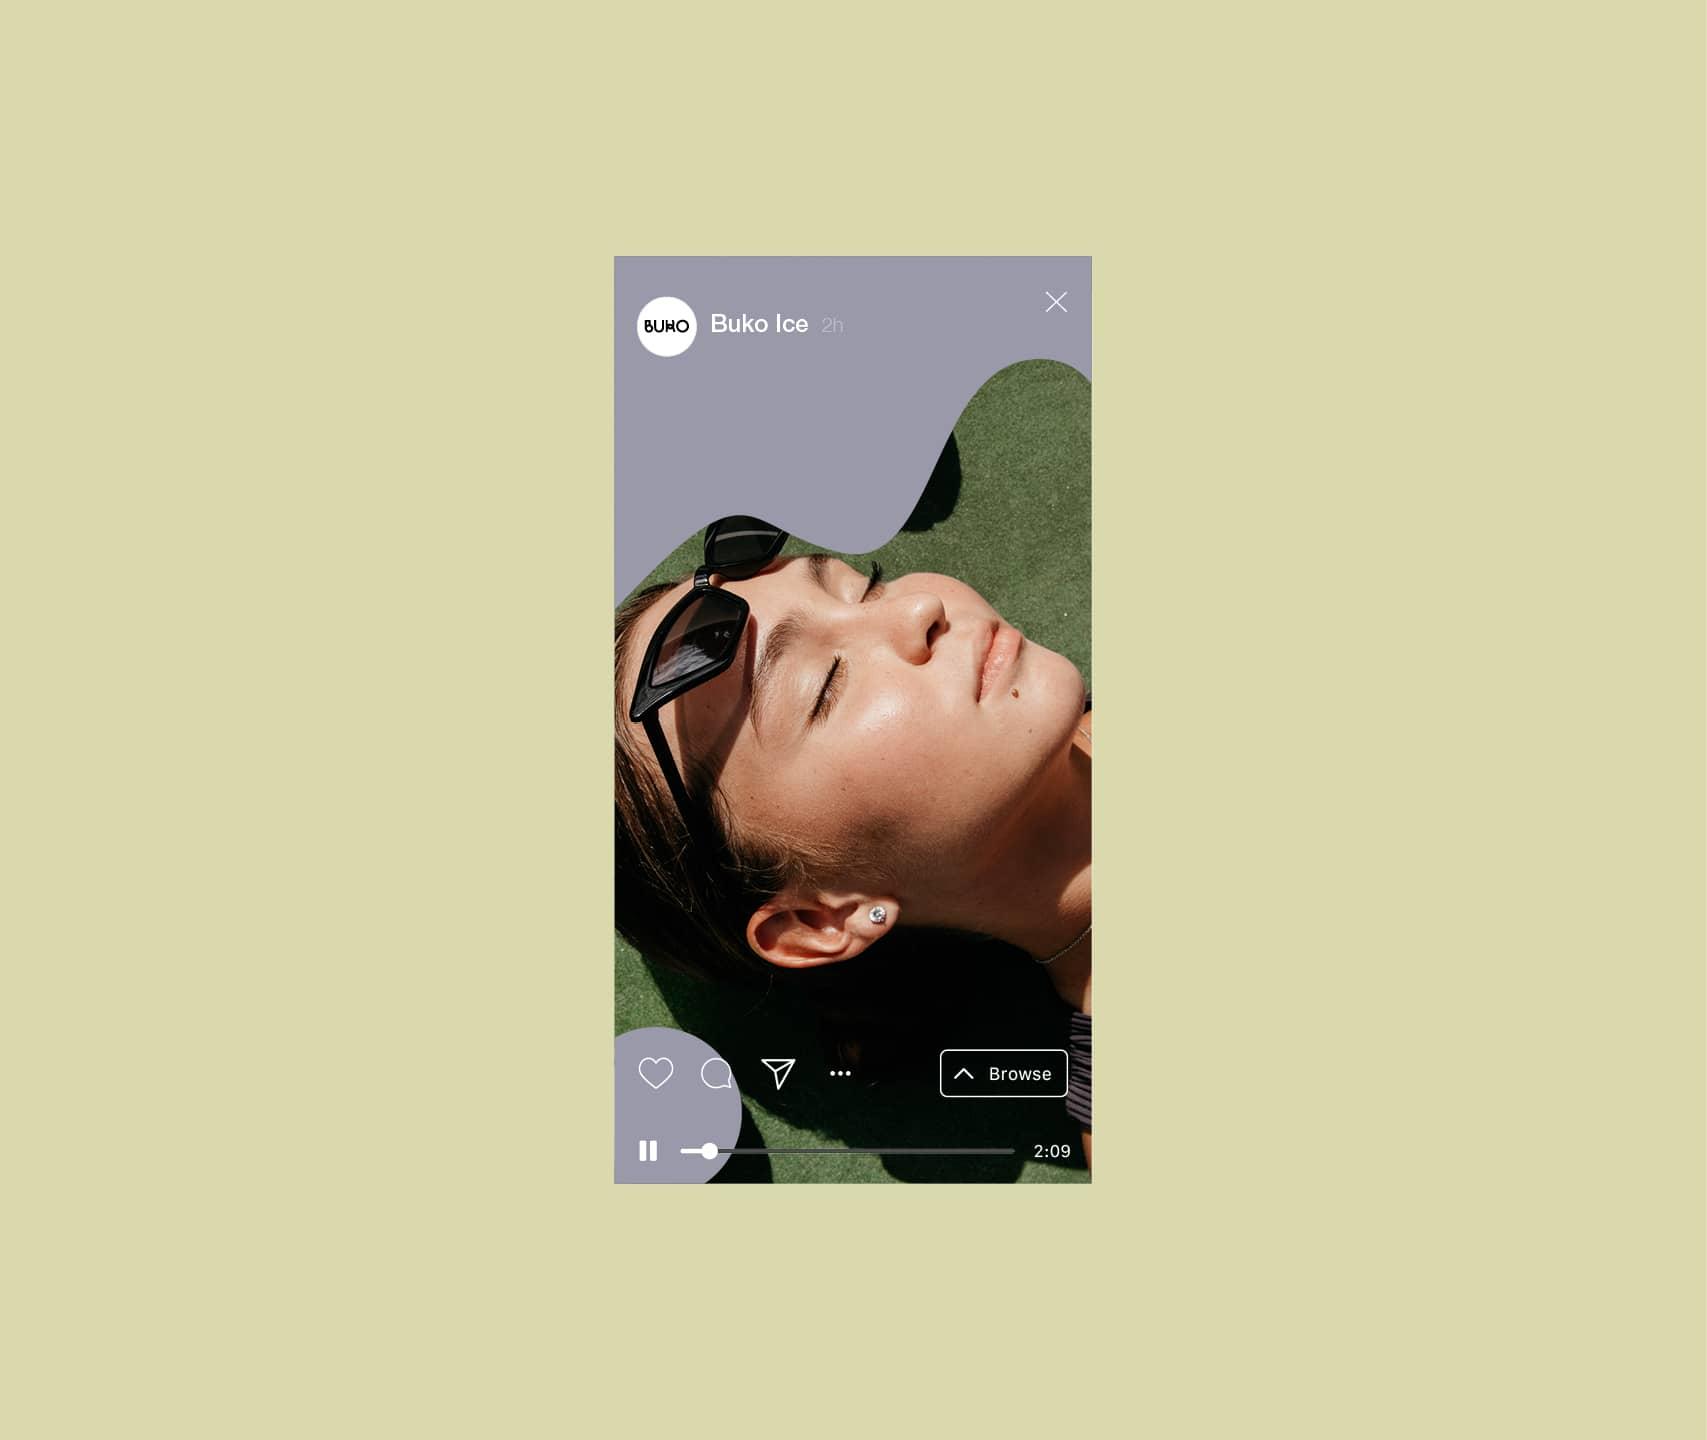 mantik-digital-creative-agency-branding-popsicle-icecream-packaging-experience-web-design-development7-min